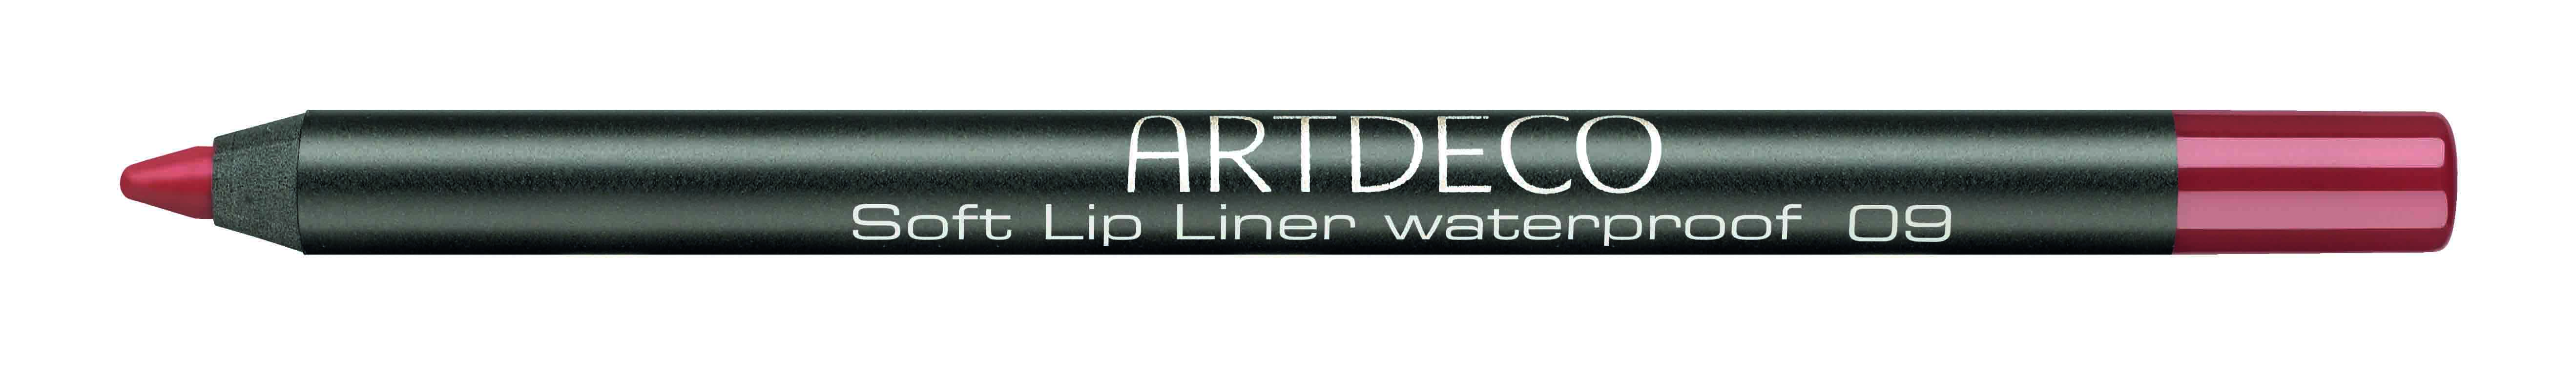 Artdeco карандаш для губ водостойкий 09 1,2г artdeco карандаш для век водостойкий 45 1 2 г